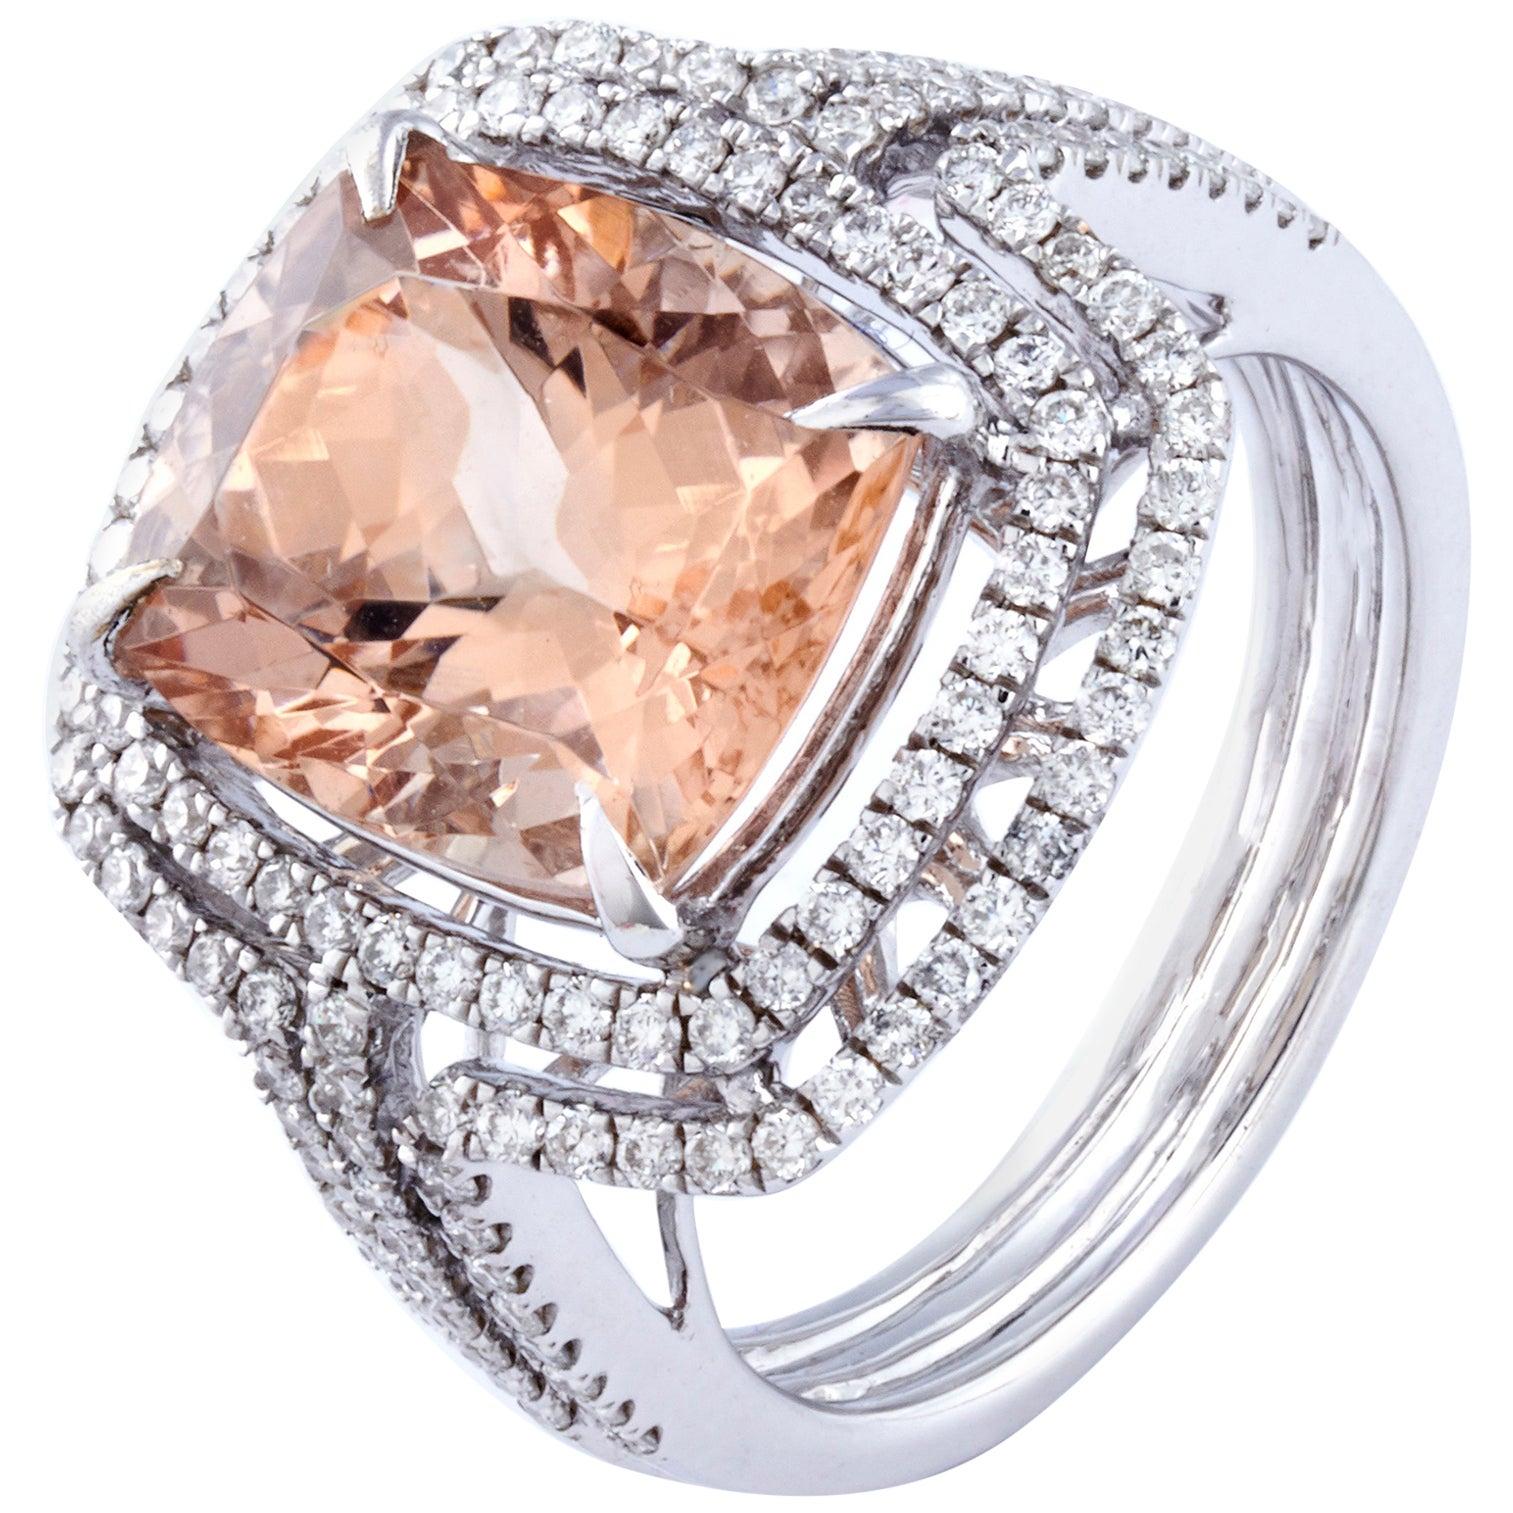 Morganite Diamond Fashion Ring Set in 18 Karat White Gold 'VS/G Diamonds'